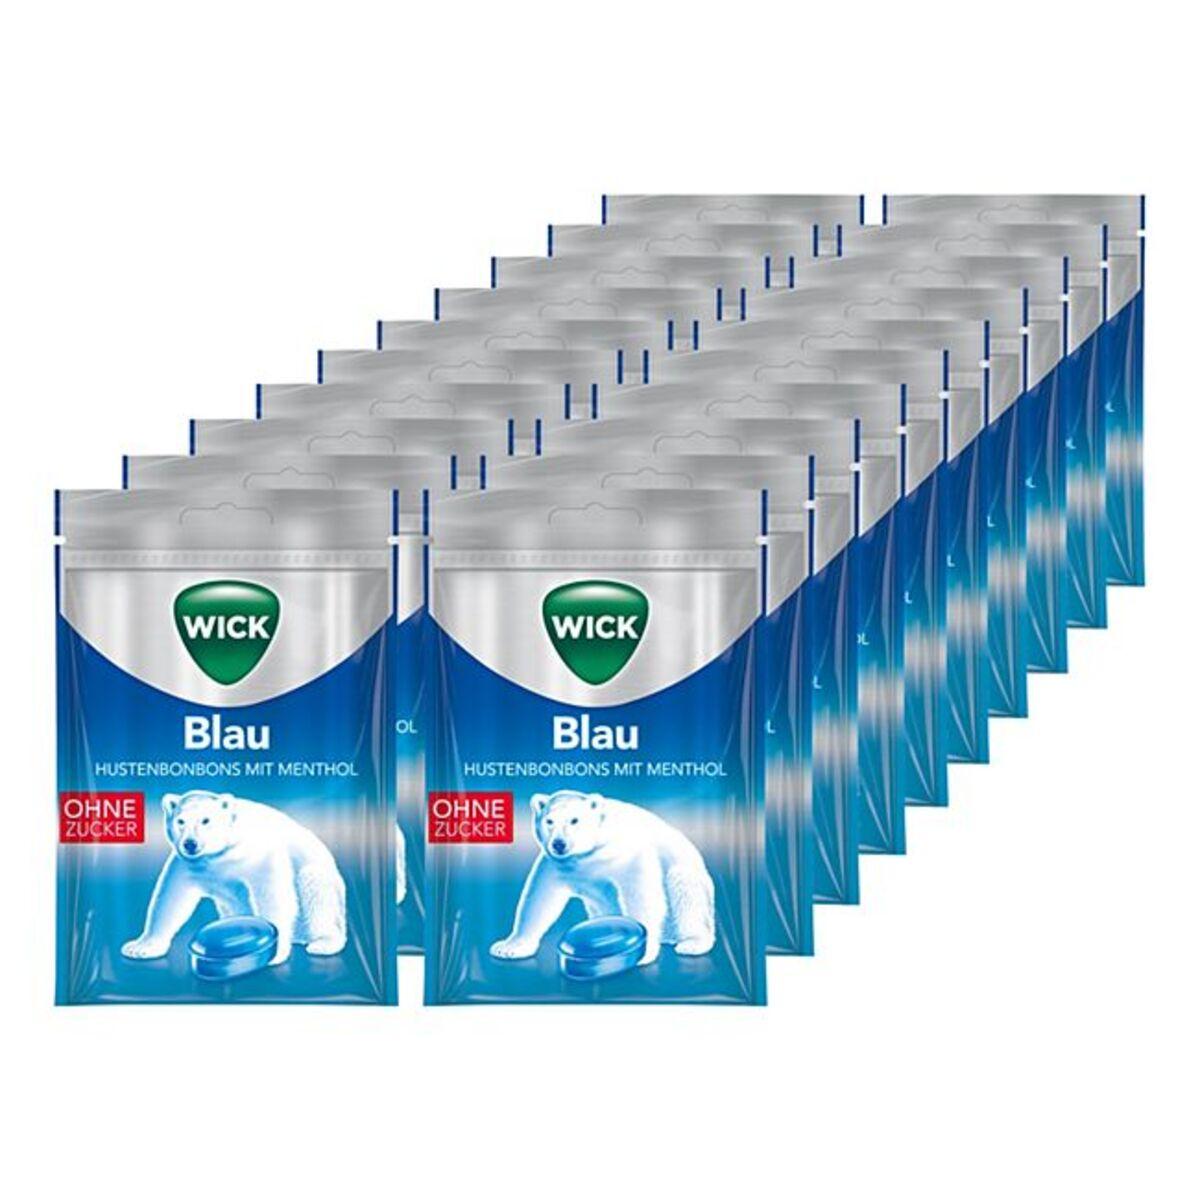 Bild 1 von Wick Blau Menthol Hustenbonbons 72 g, 20er Pack